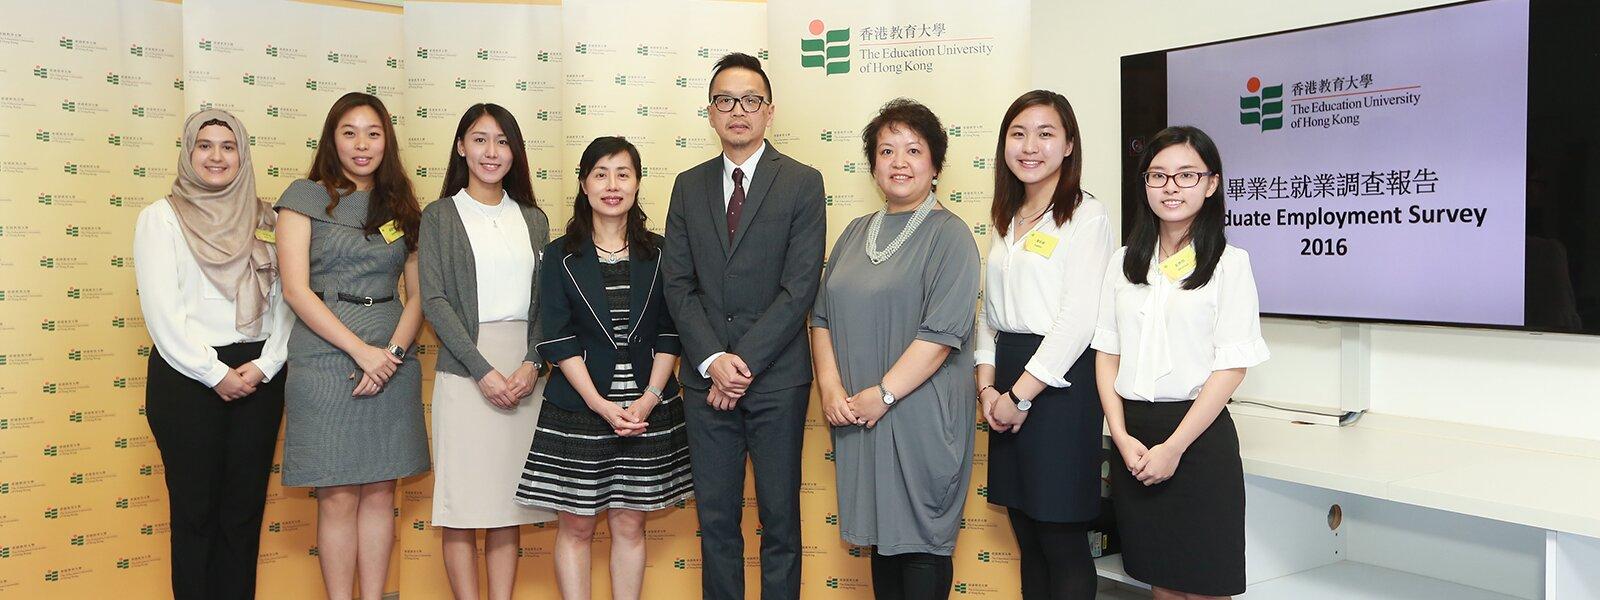 EdUHK Survey: Starting Salary for Education Graduates Approaches HK$25,000